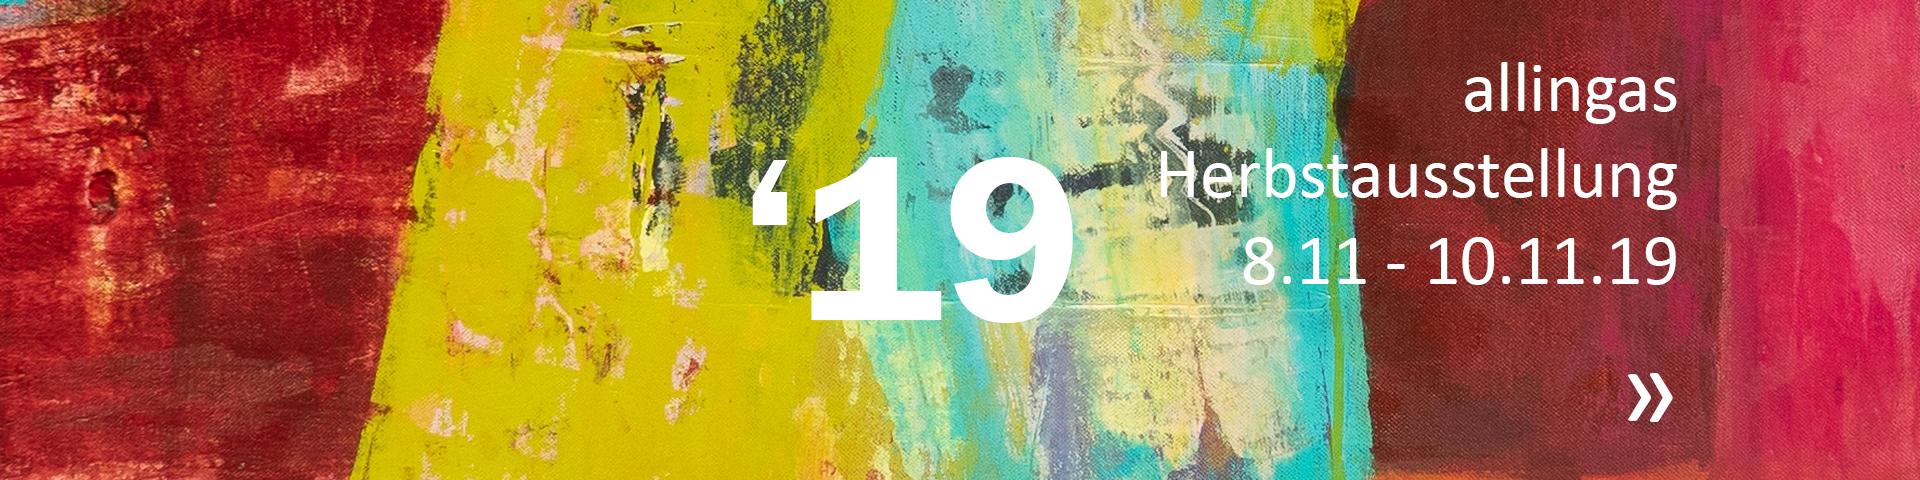 allingas Herbstausstellung 2019